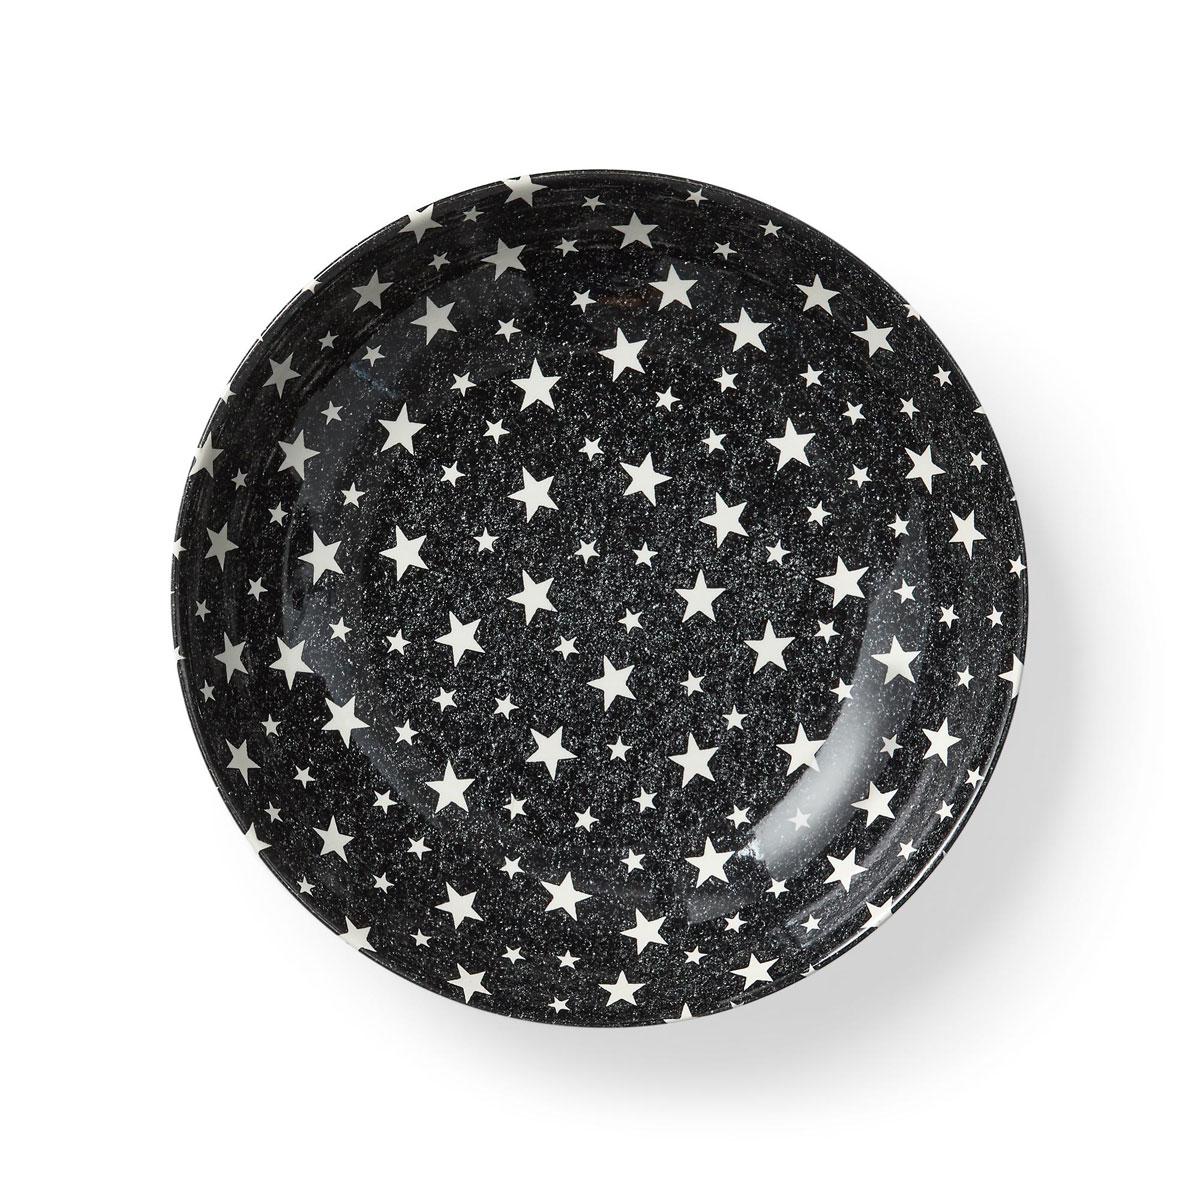 Ralph Lauren China Midnight Sky Pasta Bowl, Dark Black